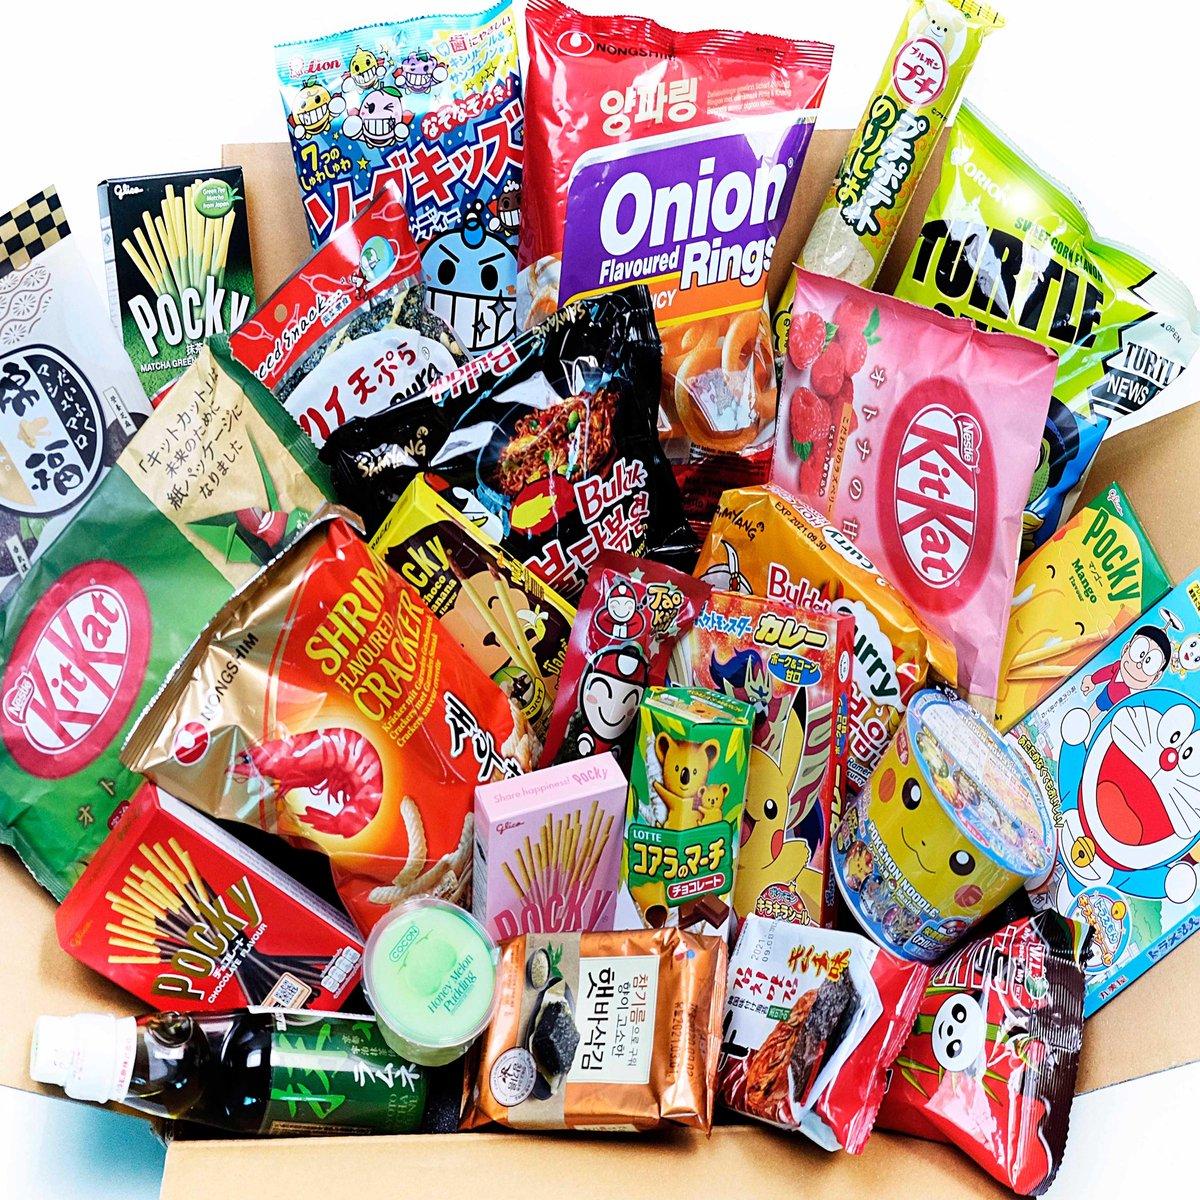 Korean Japans Snack Snoep Pakket Box - Matcha - Kitkat Chocolade - Pocky - Zoete en hartige snacks -